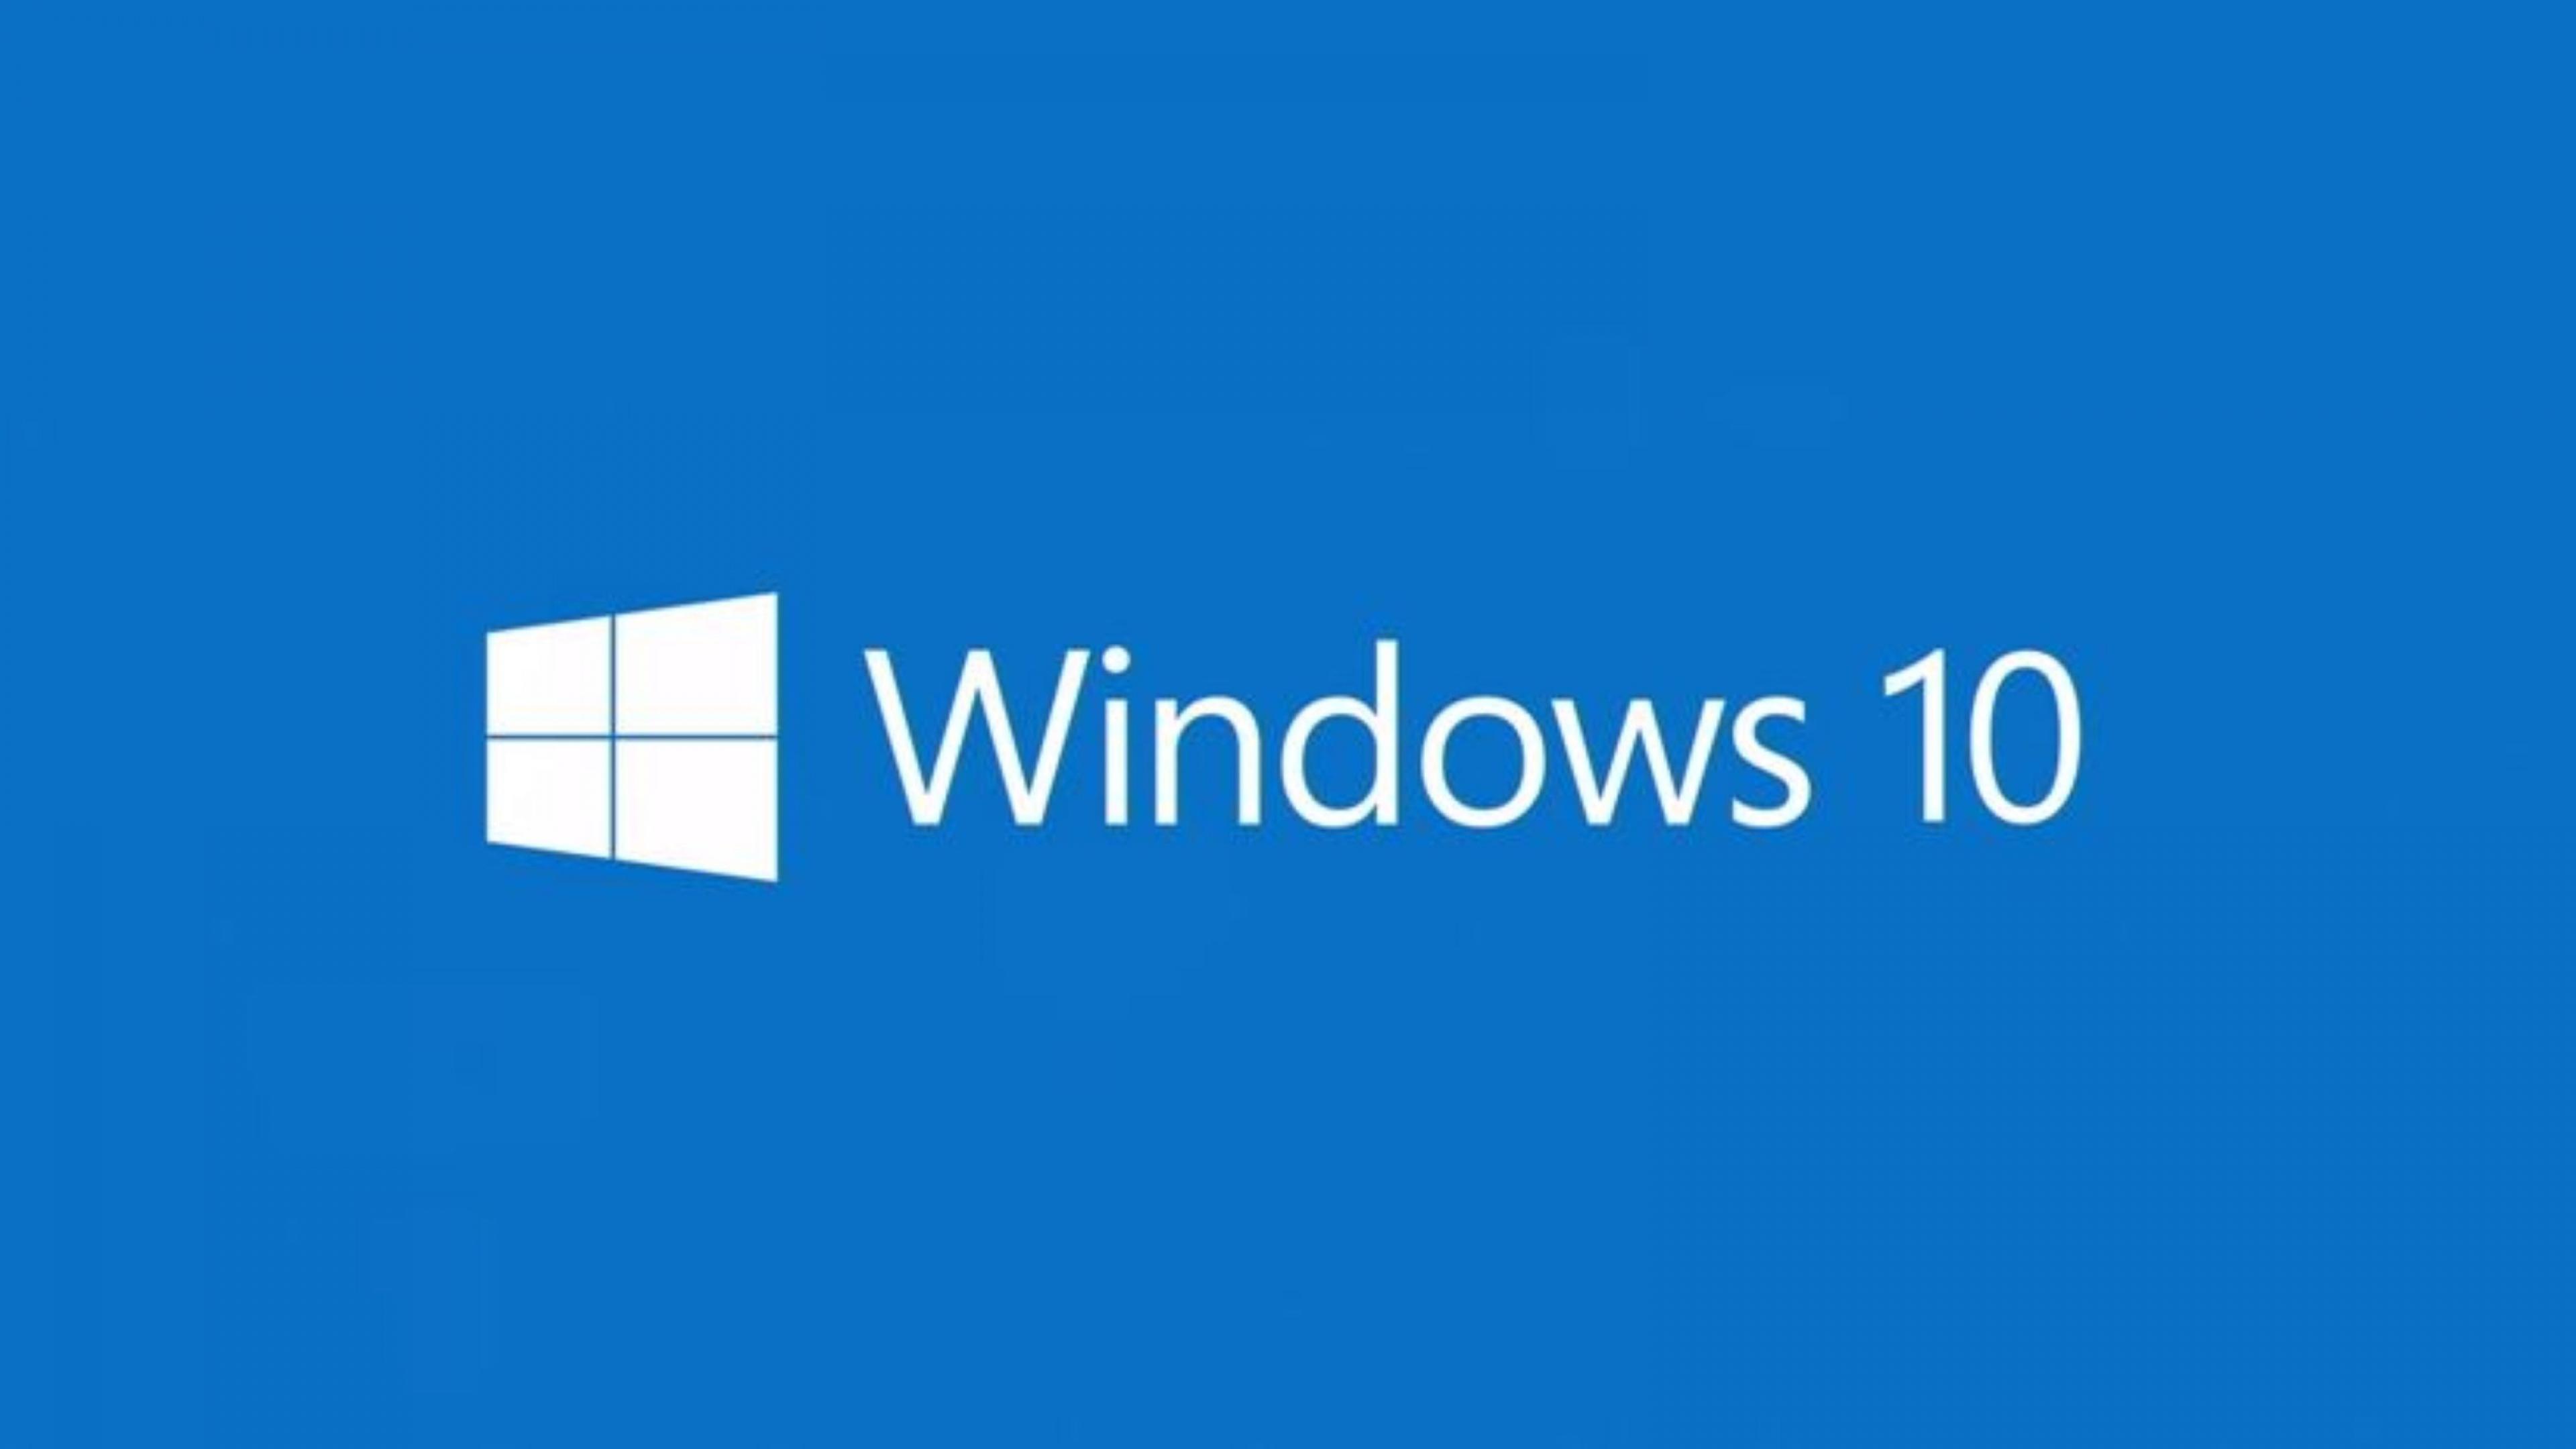 windows 10 4k wallpapers ultra hd top 15 axeetech